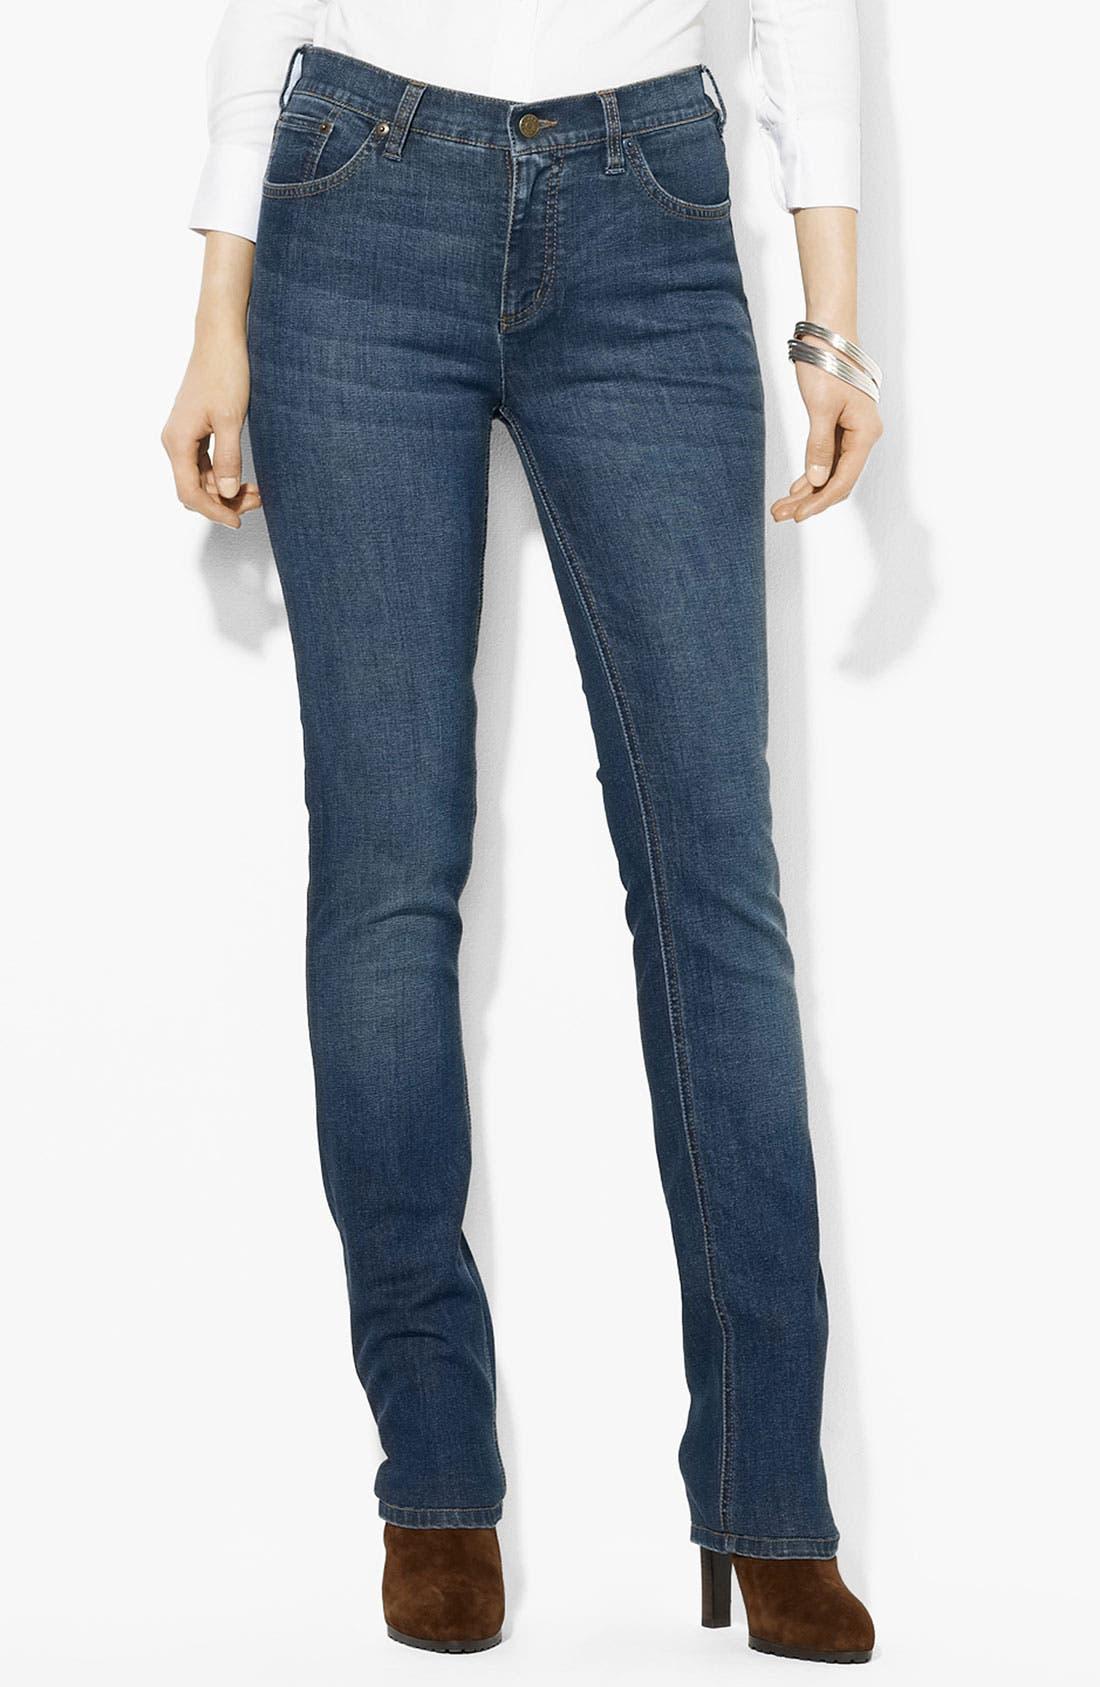 Main Image - Lauren Ralph Lauren Slimming Straight Leg Jeans (Petite) (Online Only)